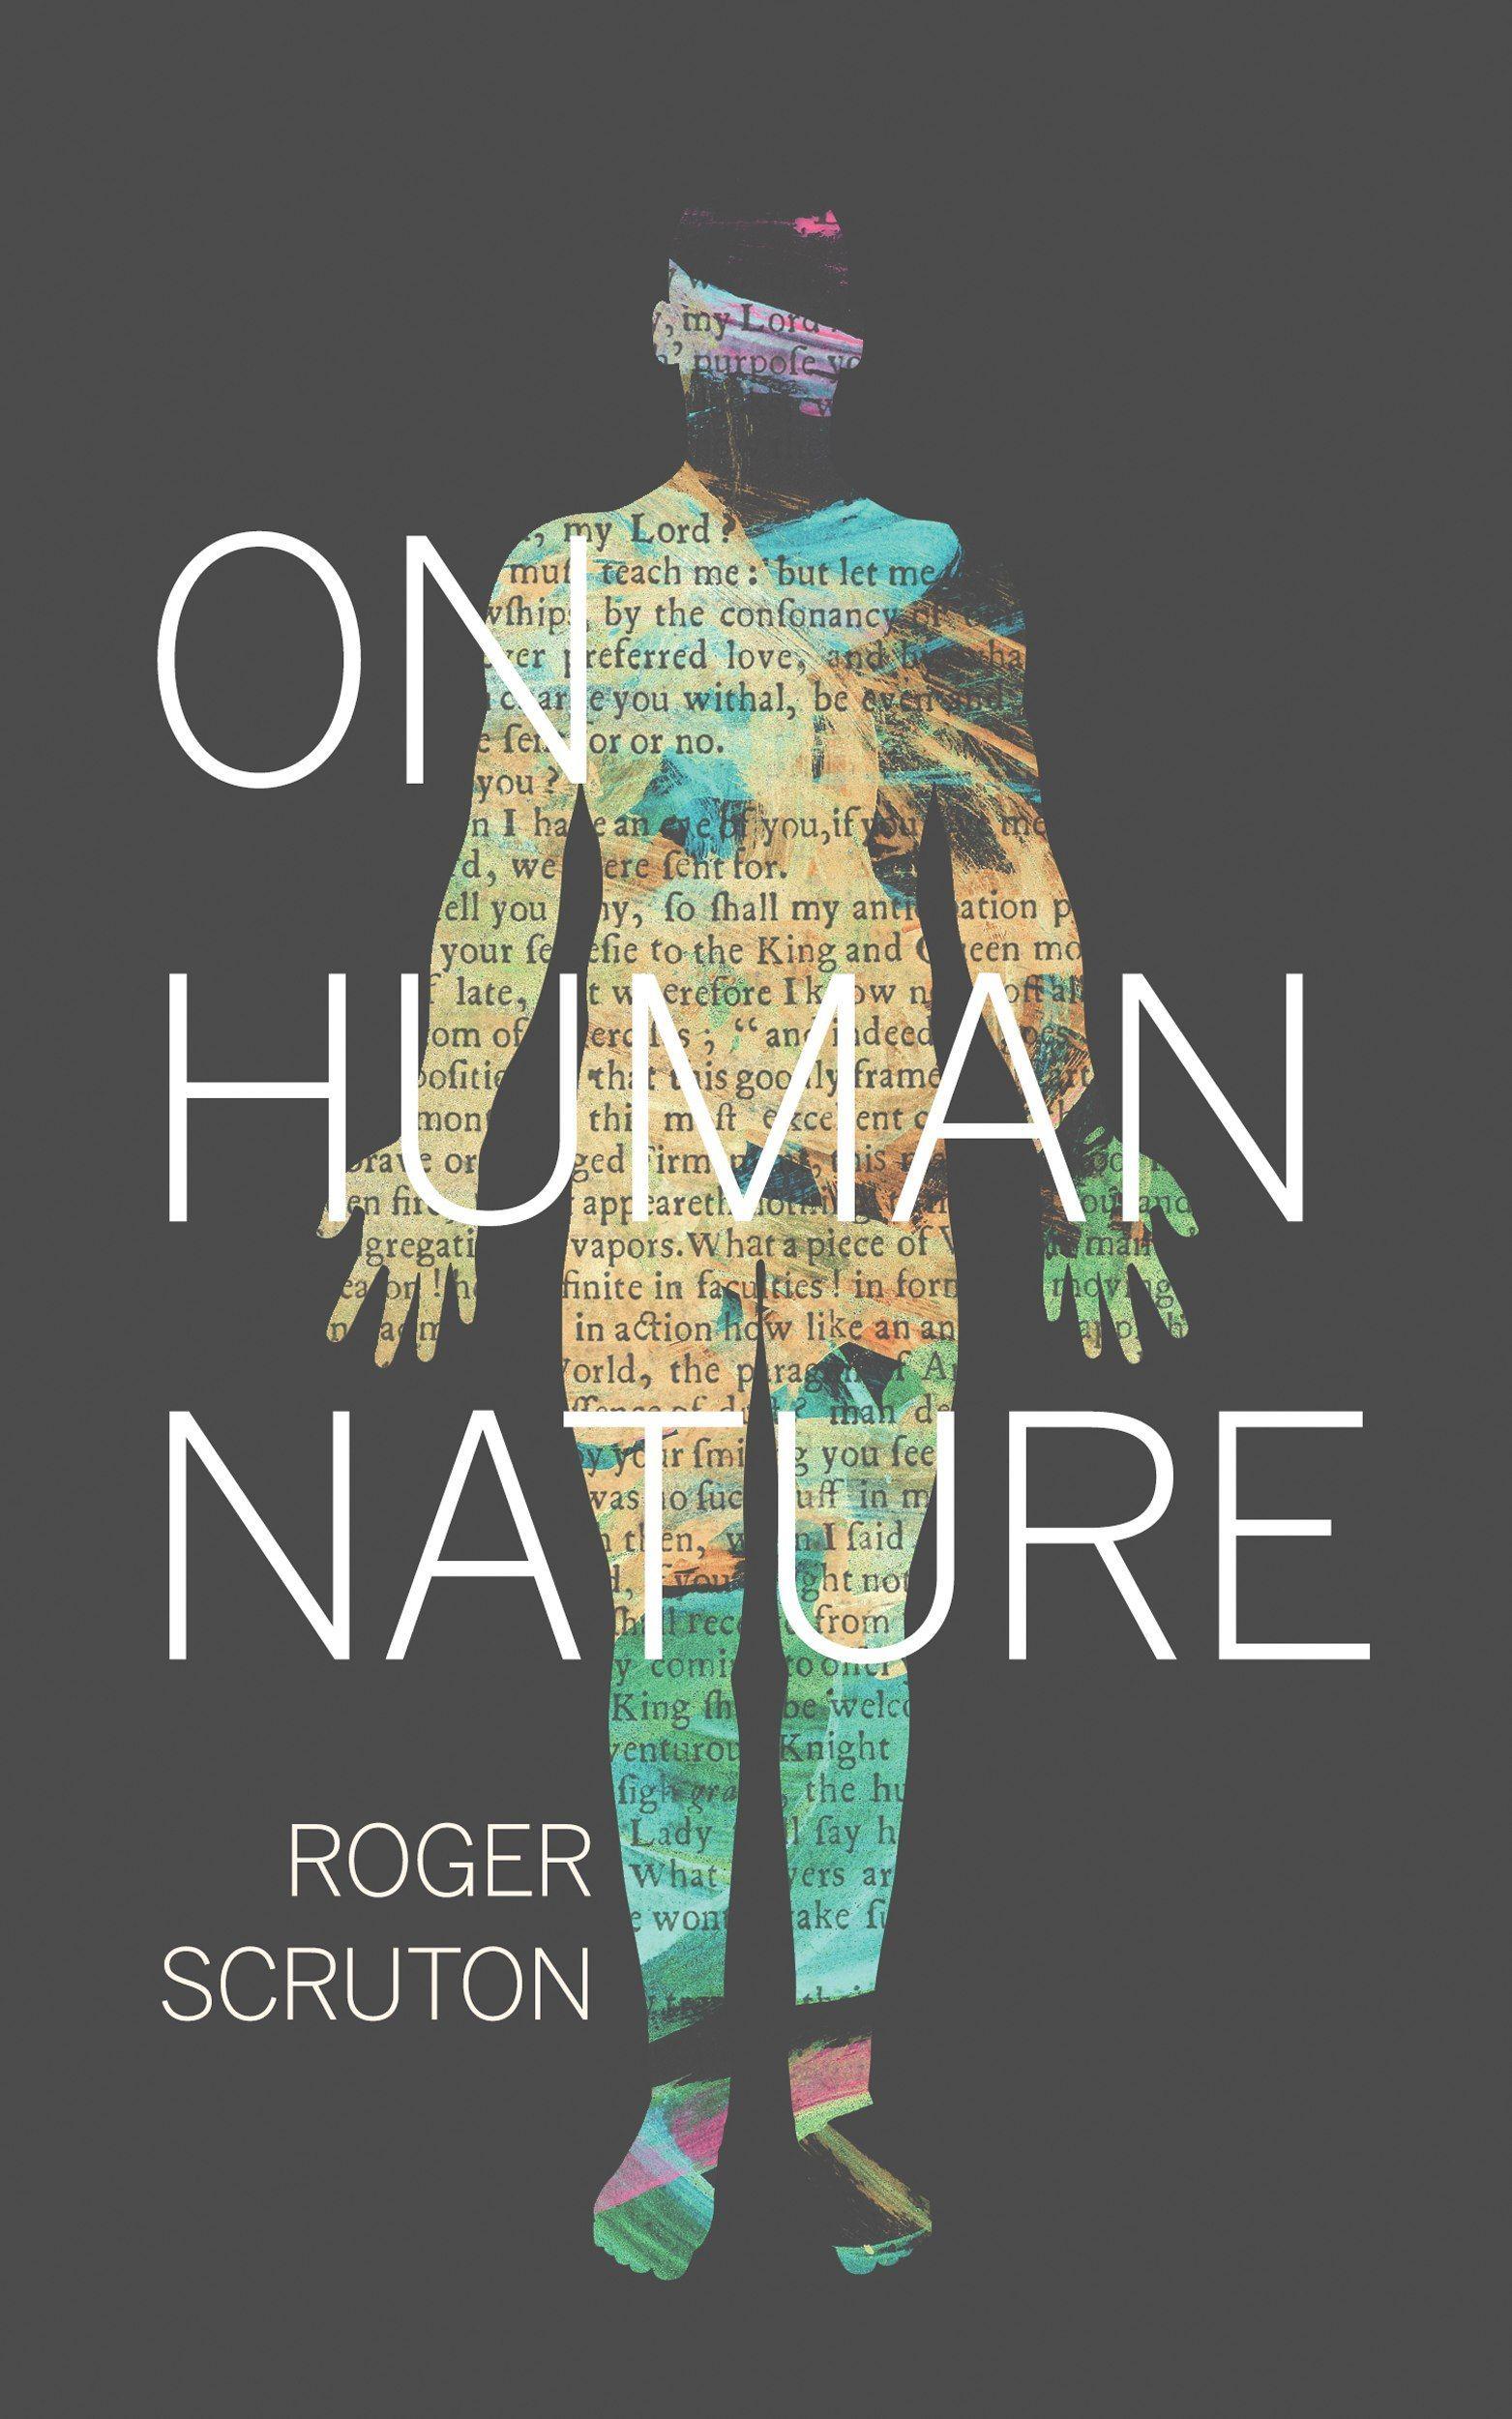 Scruton On Human Nature